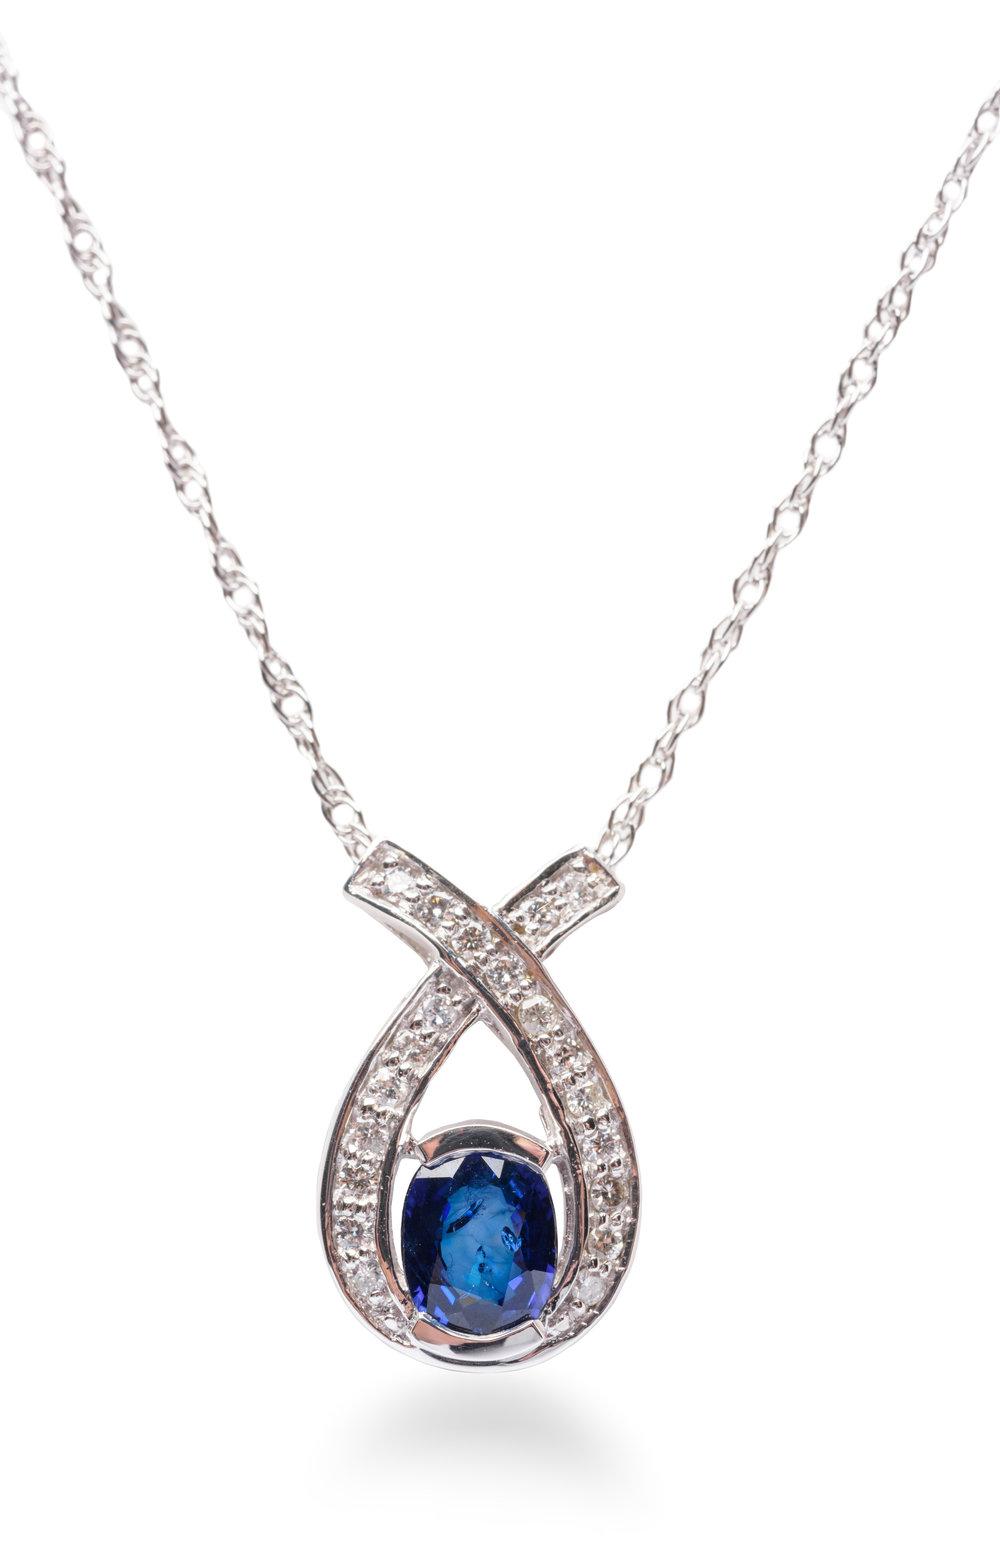 7290_Byzantine_Jewelers_Santa_Cruz_Product_Photography_edit.jpg